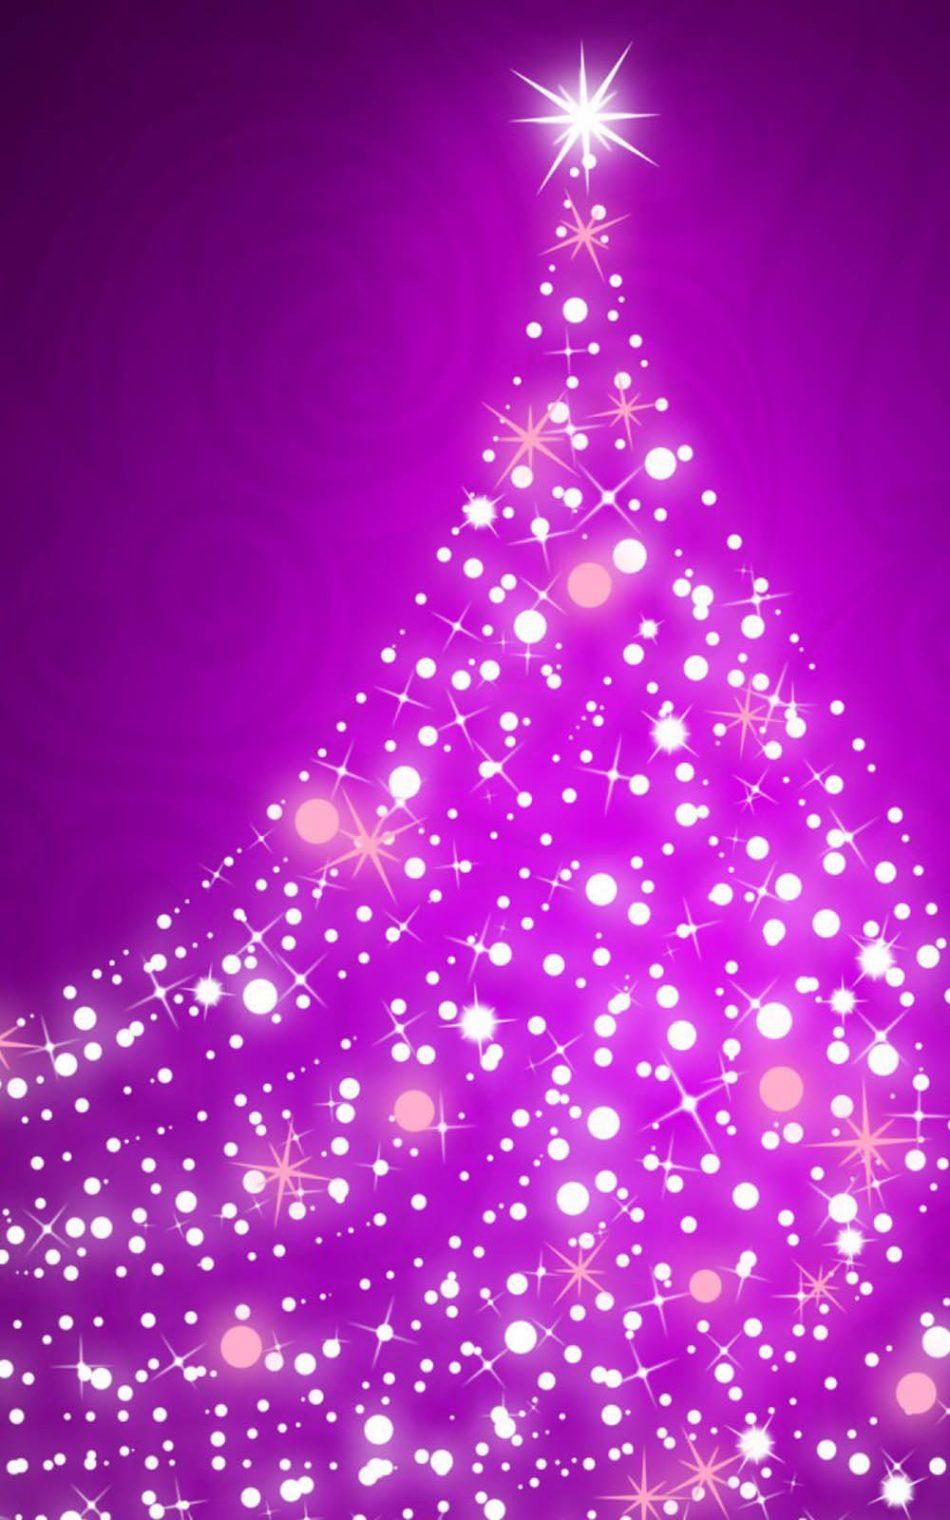 Download christmas tree lights purple background free pure - Purple christmas desktop wallpaper ...